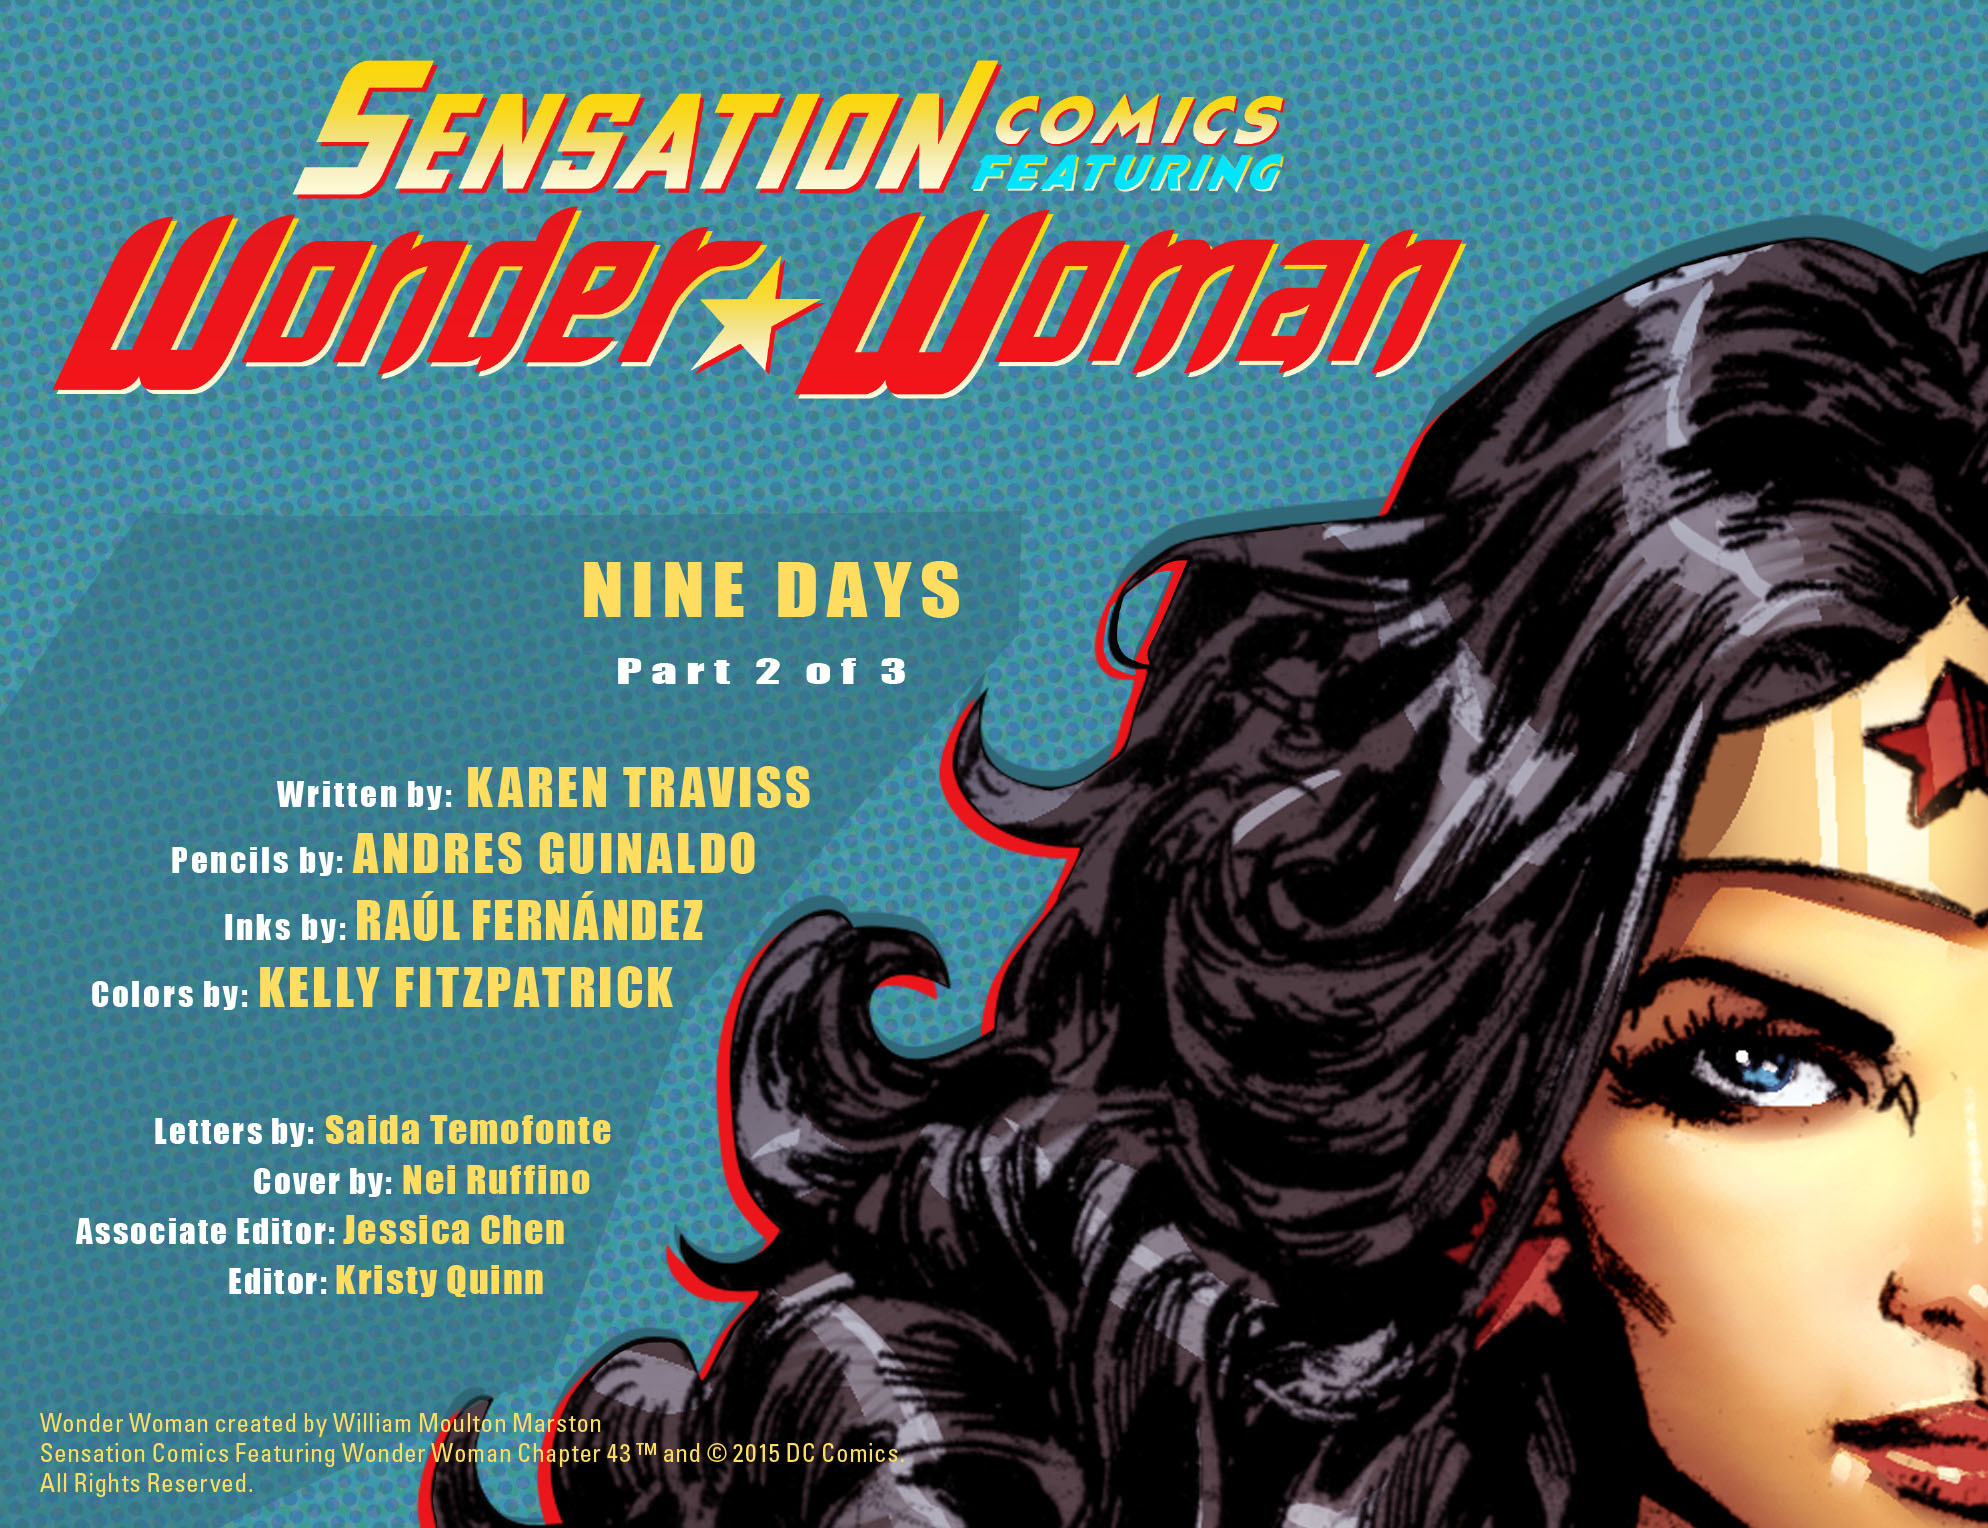 Read online Sensation Comics Featuring Wonder Woman comic -  Issue #43 - 3